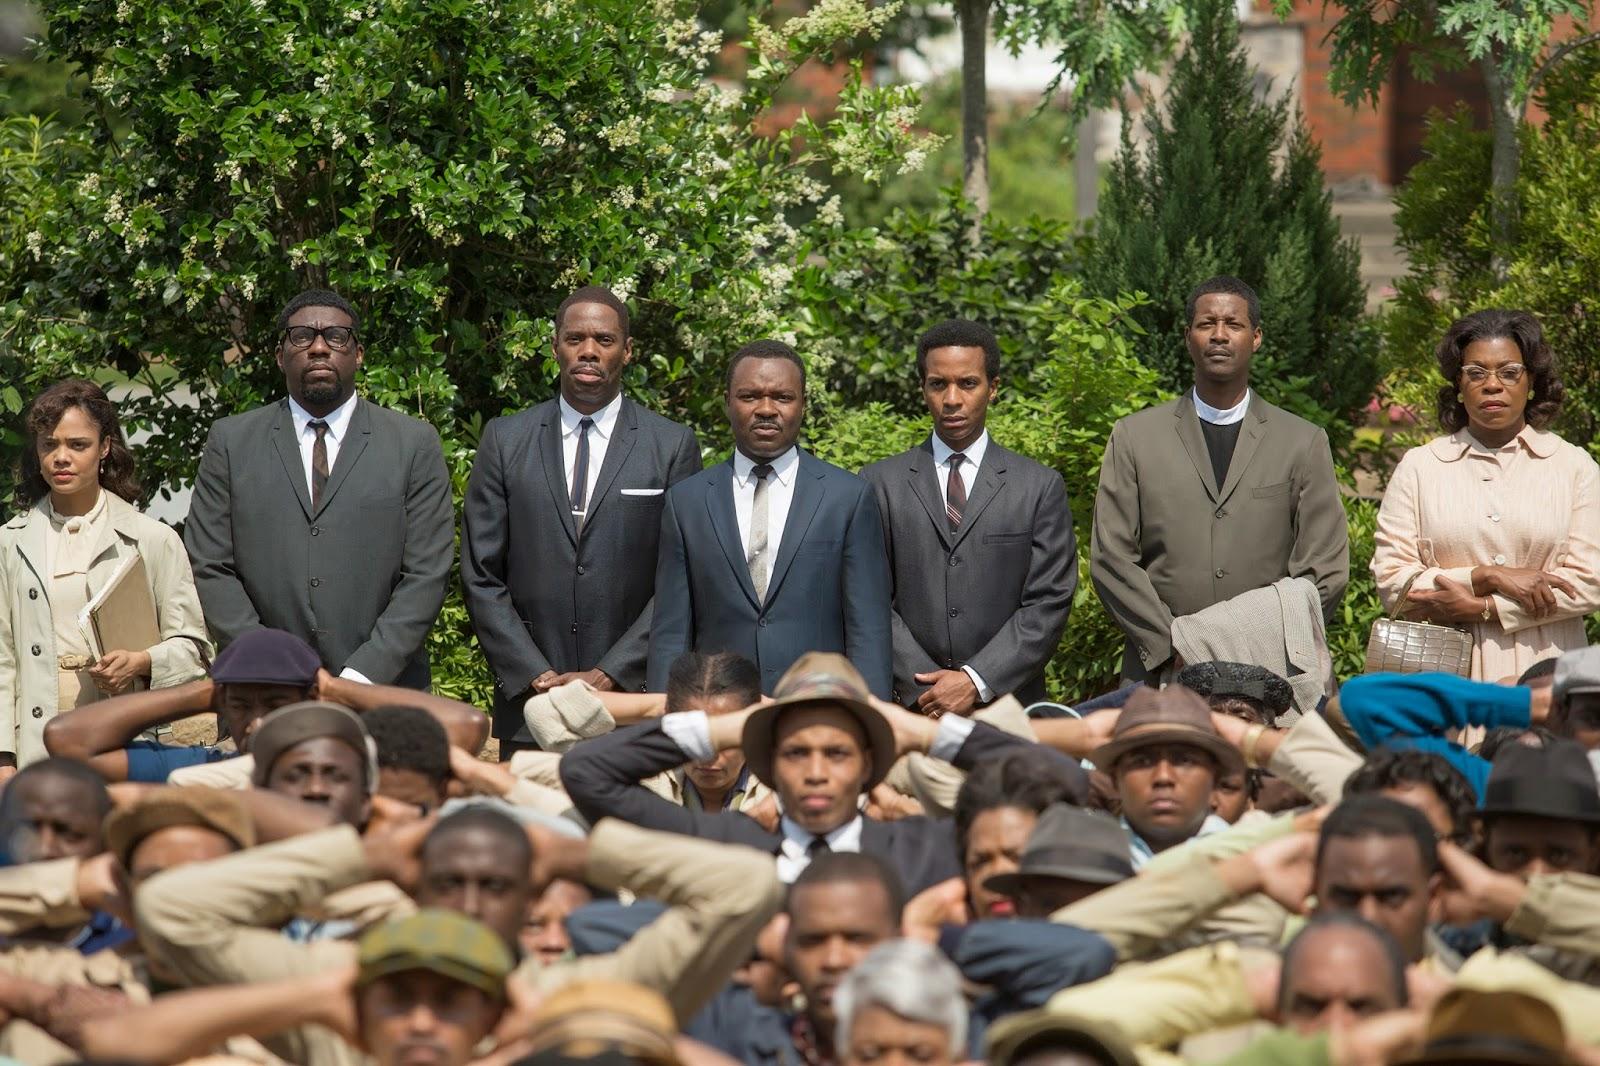 Selma, starring David Oyelowo